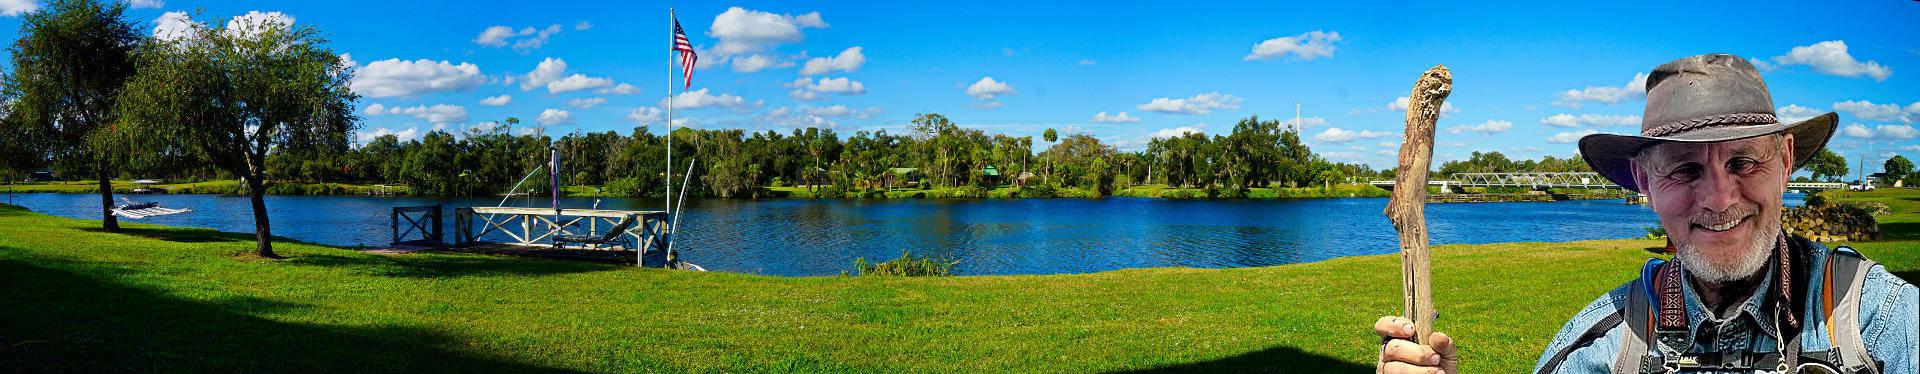 Boondockers Welcome free rv camping. Riverside. Fort Denaud à La Belle Florida